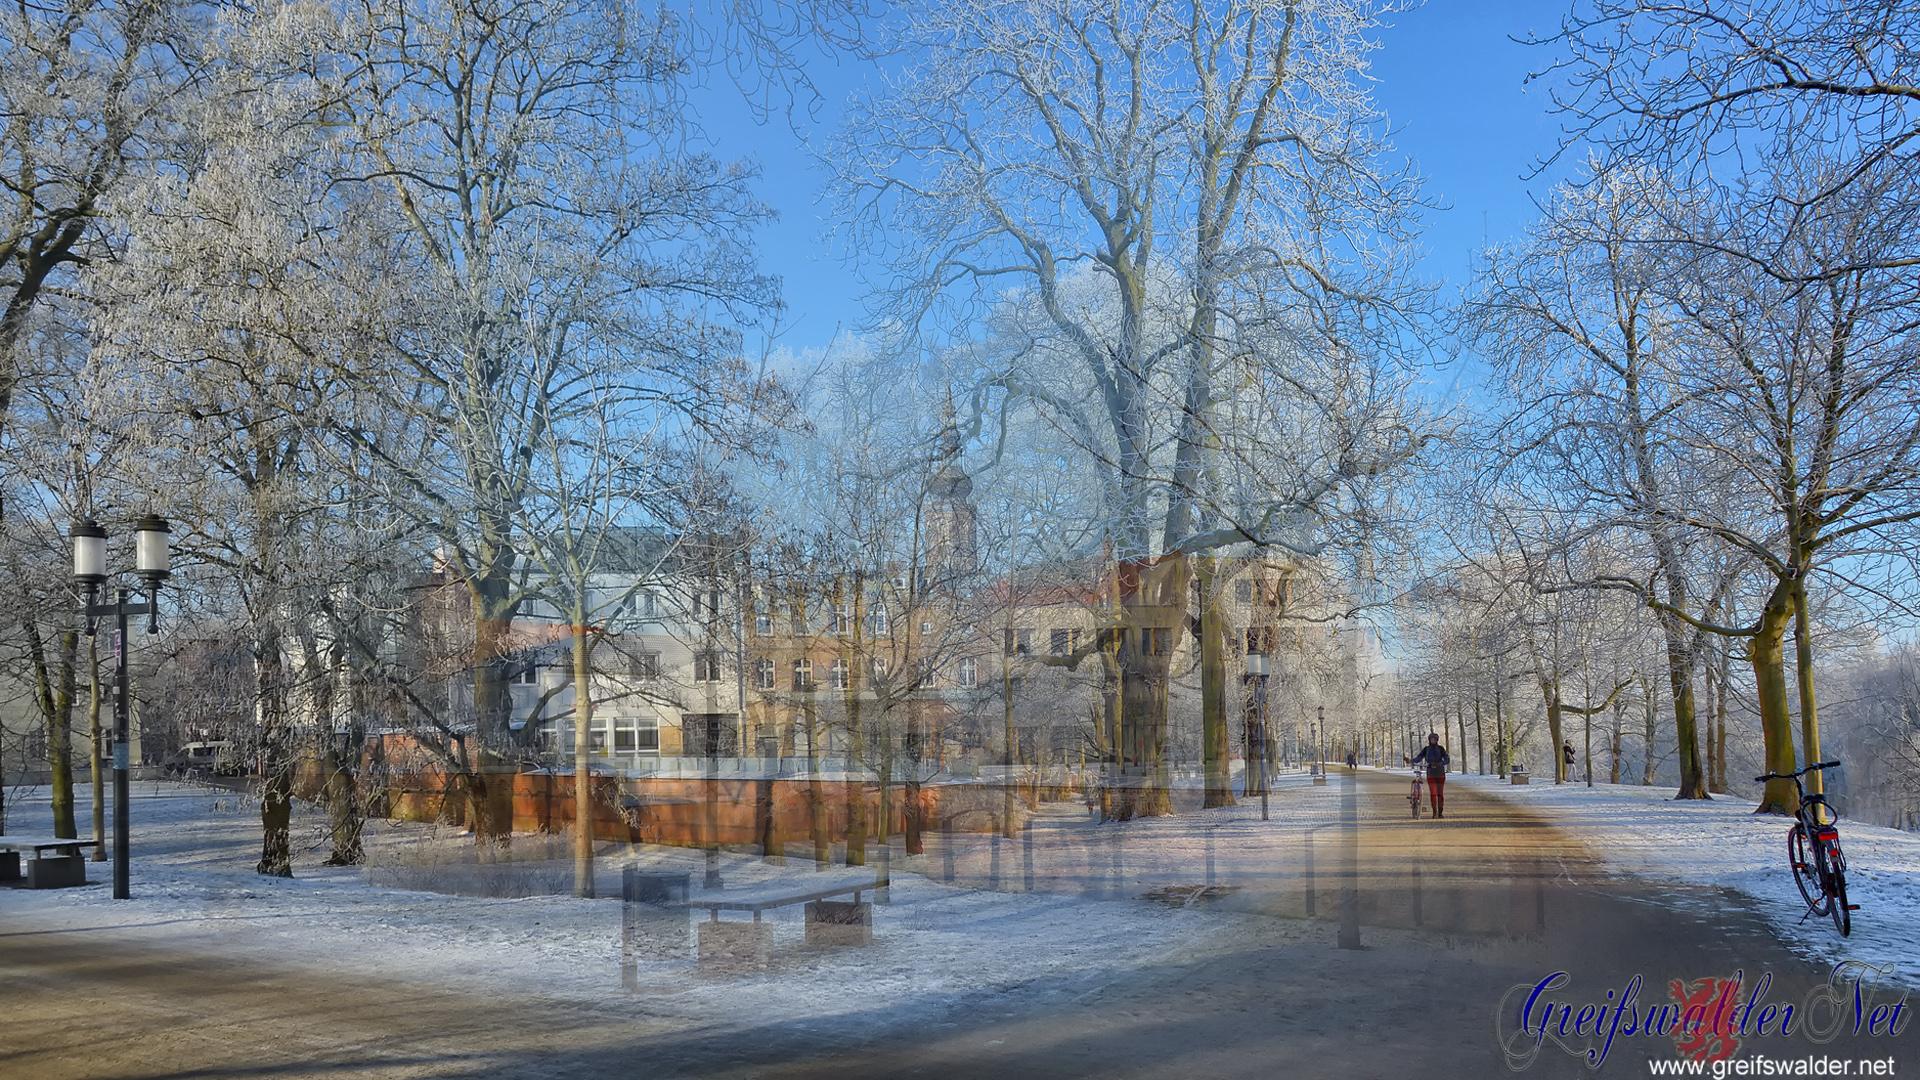 Wintertraum in Greifswald